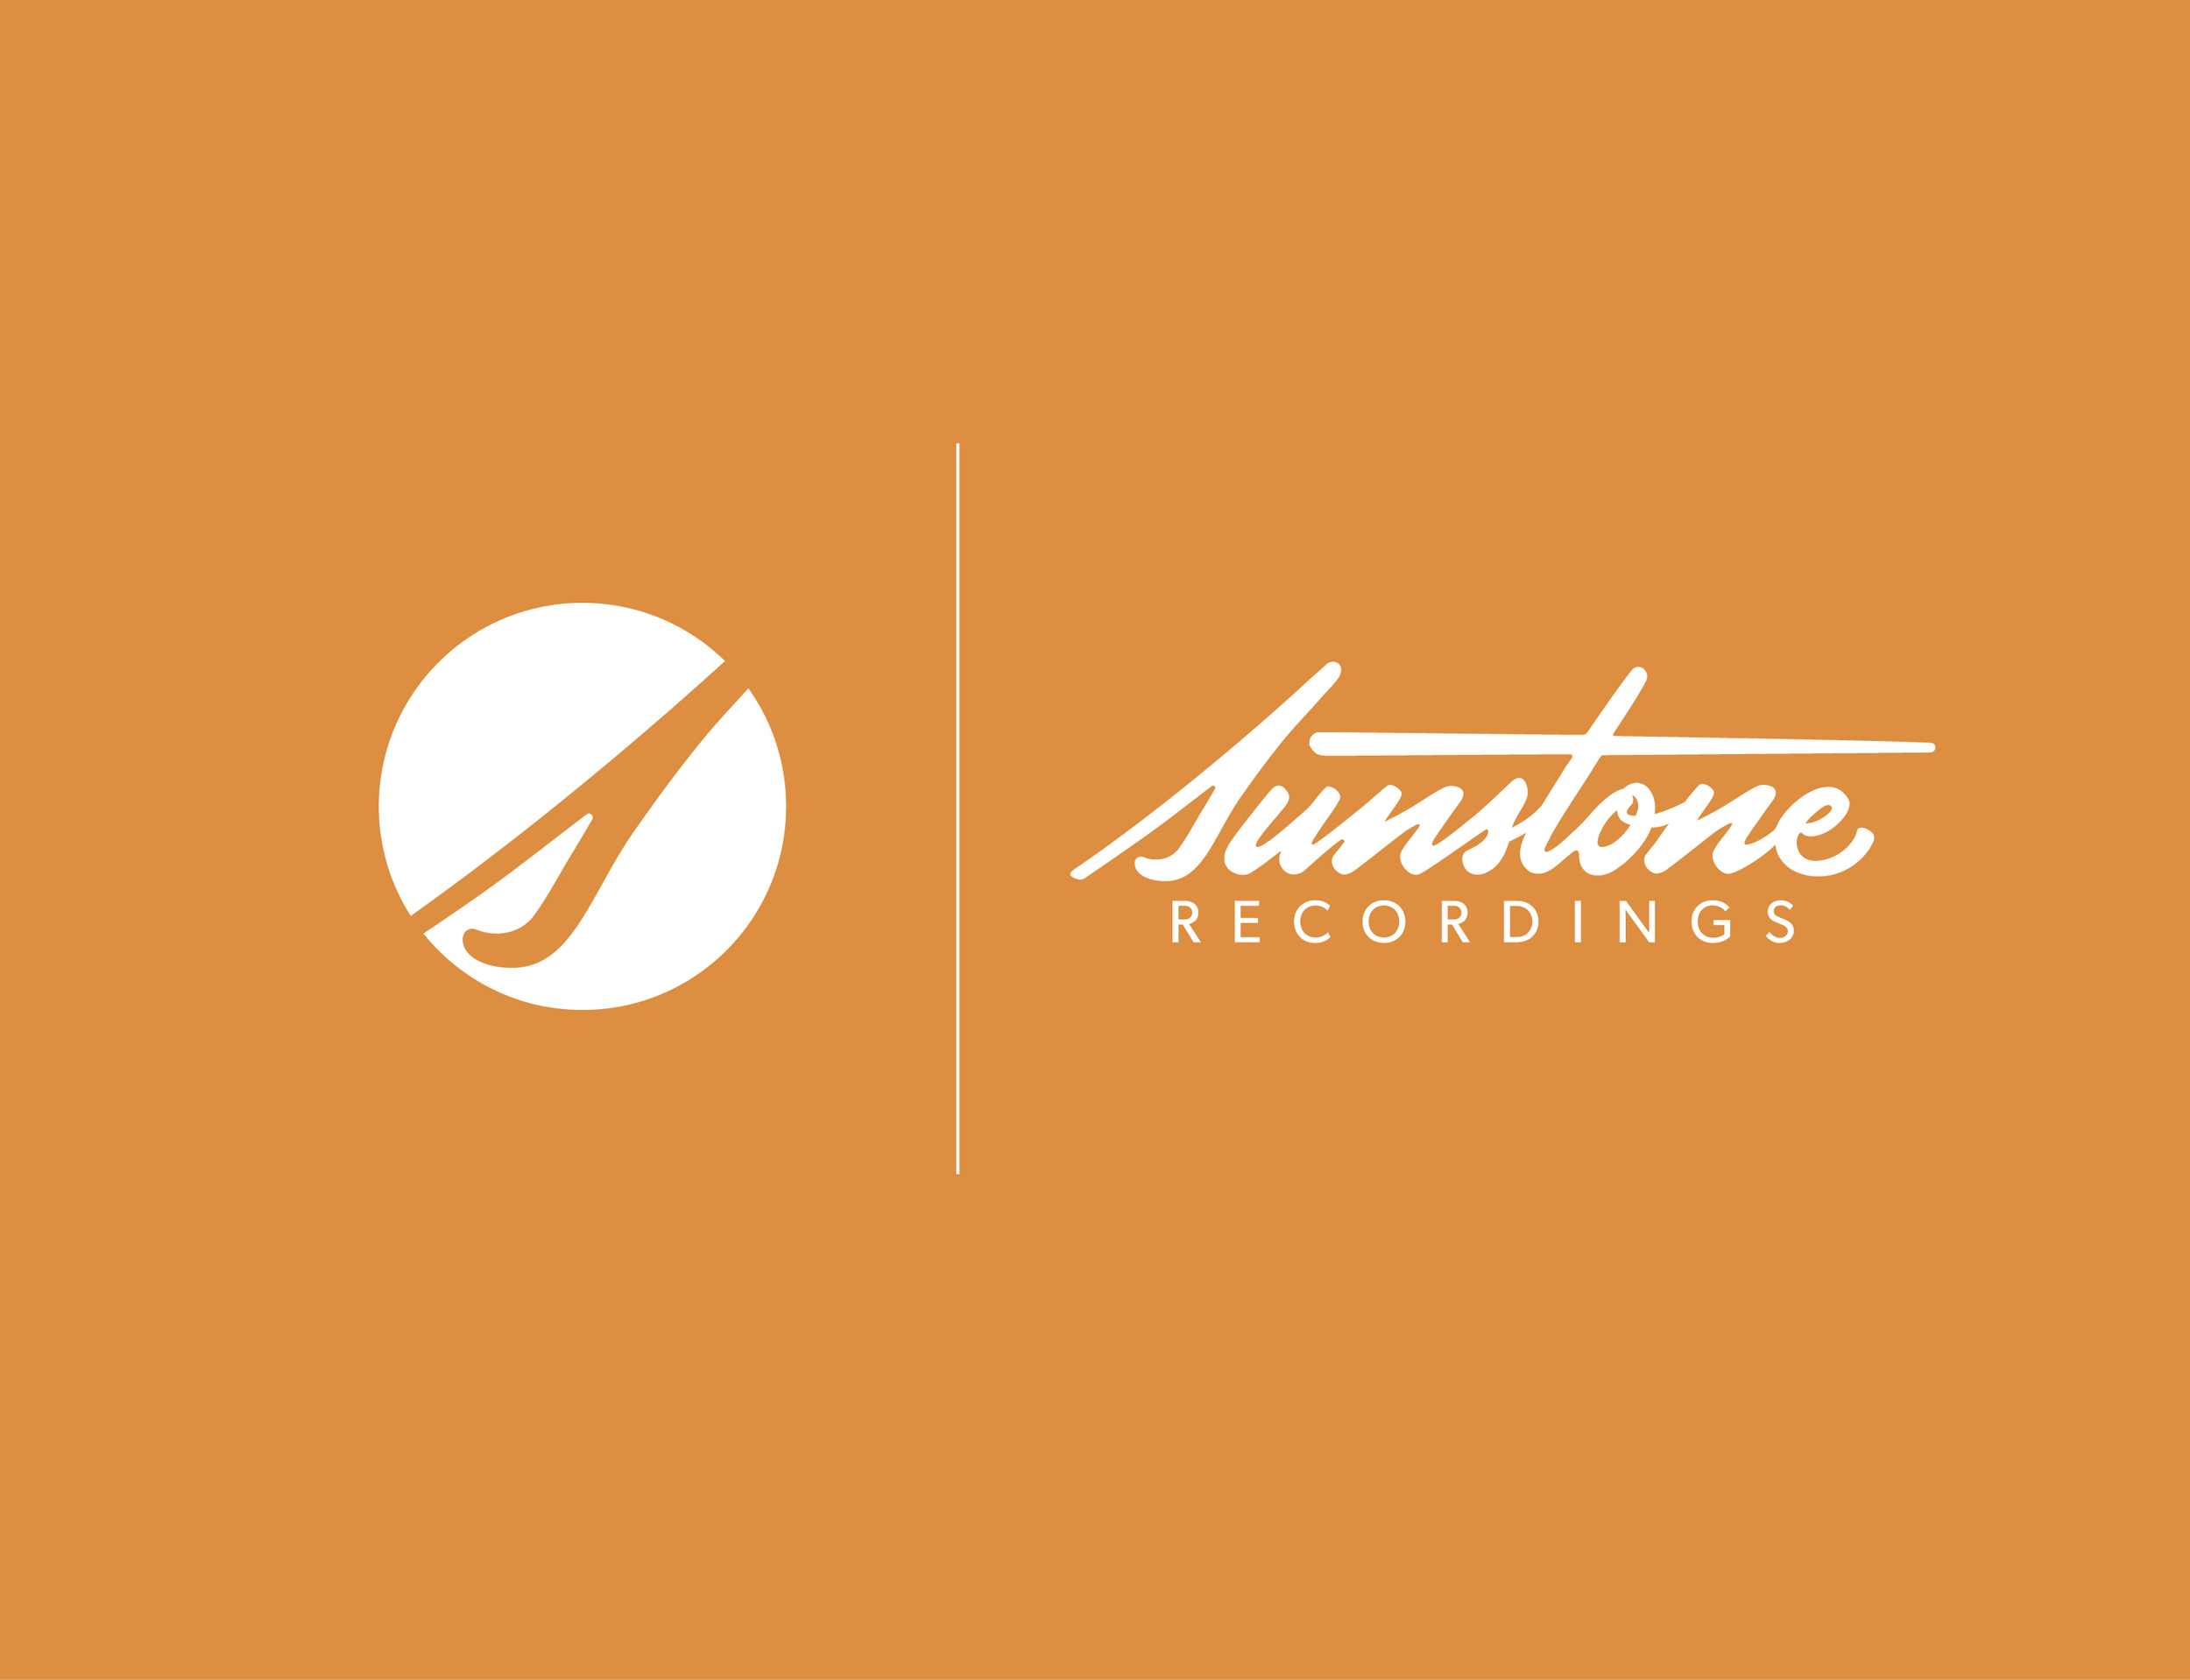 Sunstone Recordings Combined Orange